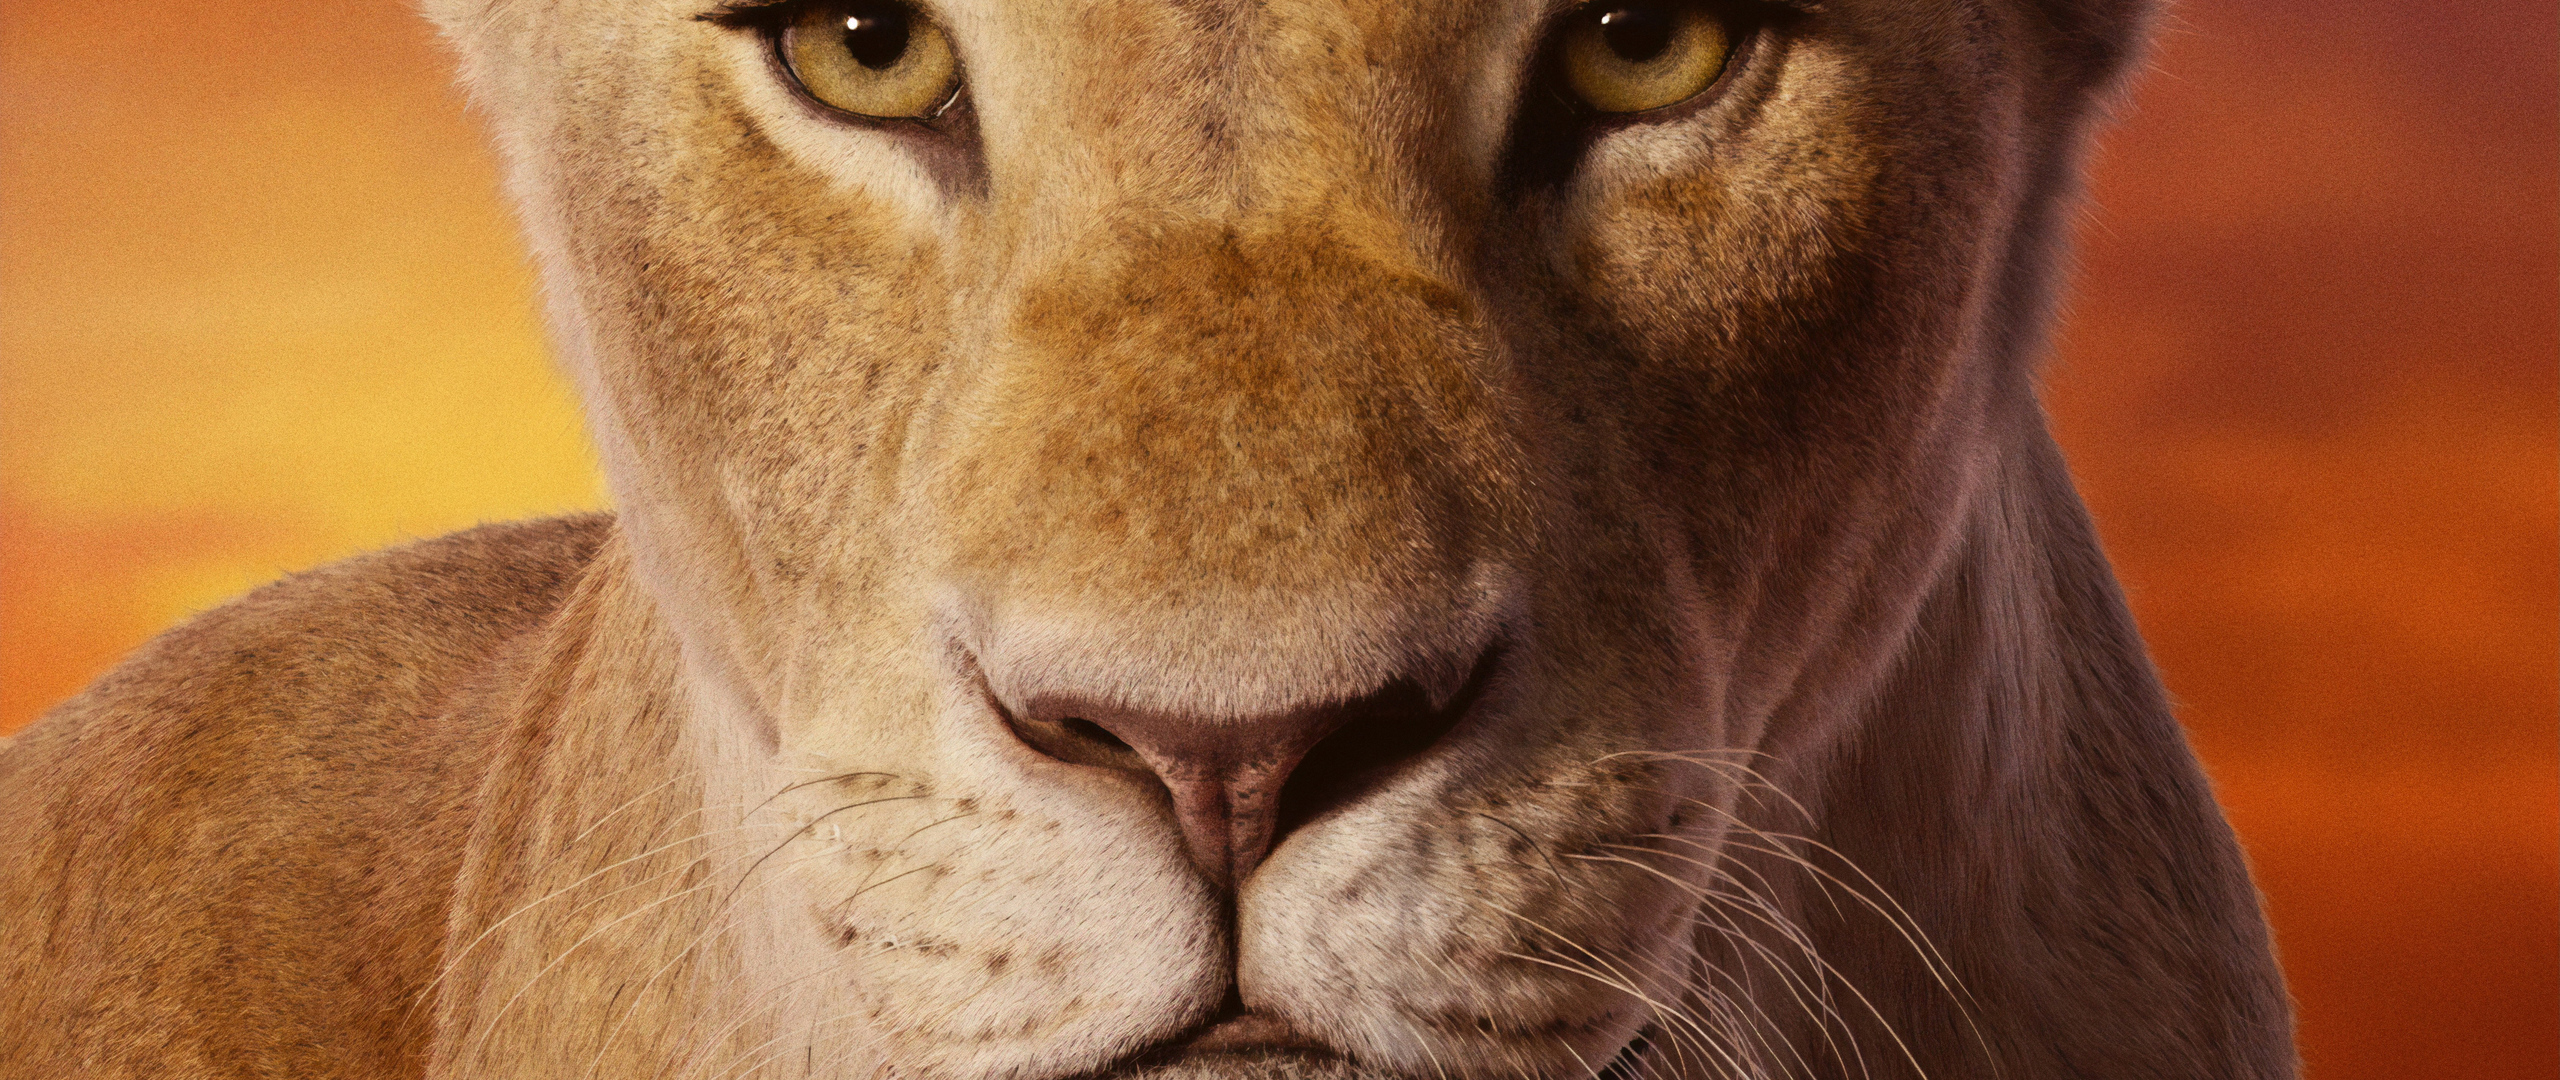 beyonce-as-nala-the-lion-king-2019-4k-gt.jpg